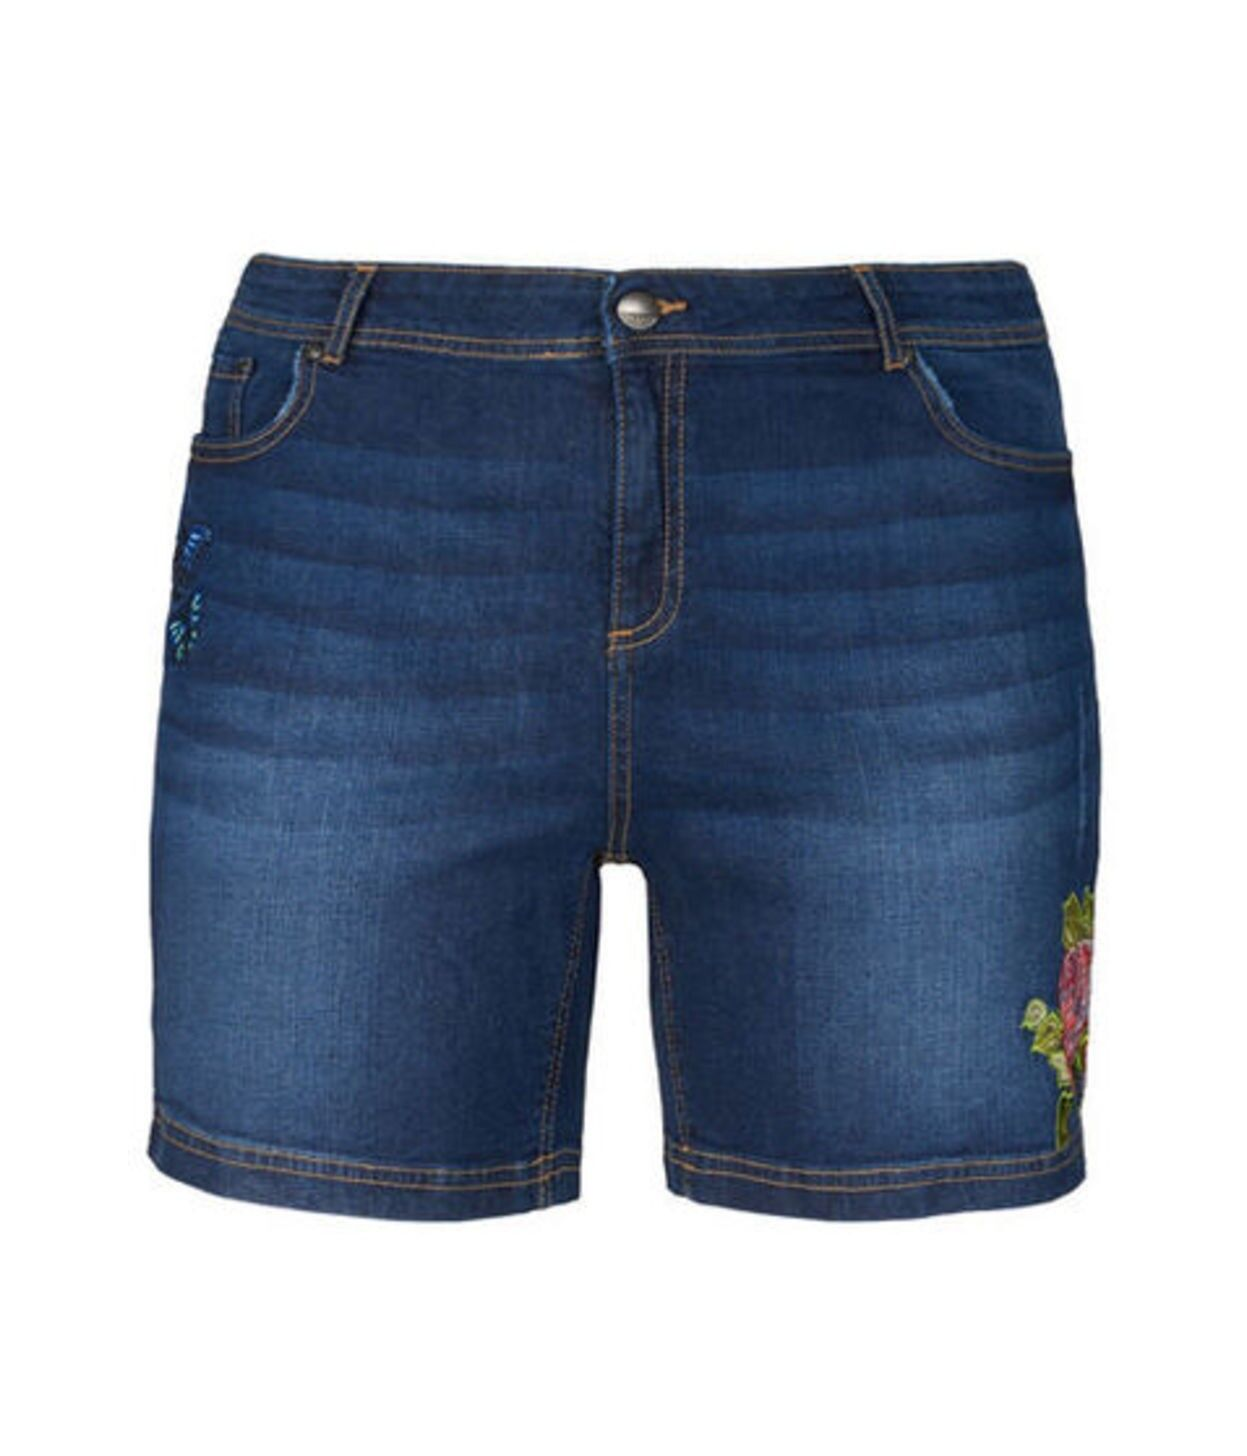 48 50 56 52 54 Neu Janina Damen Jeans Shorts // kurze Hose mit Stickerei Gr